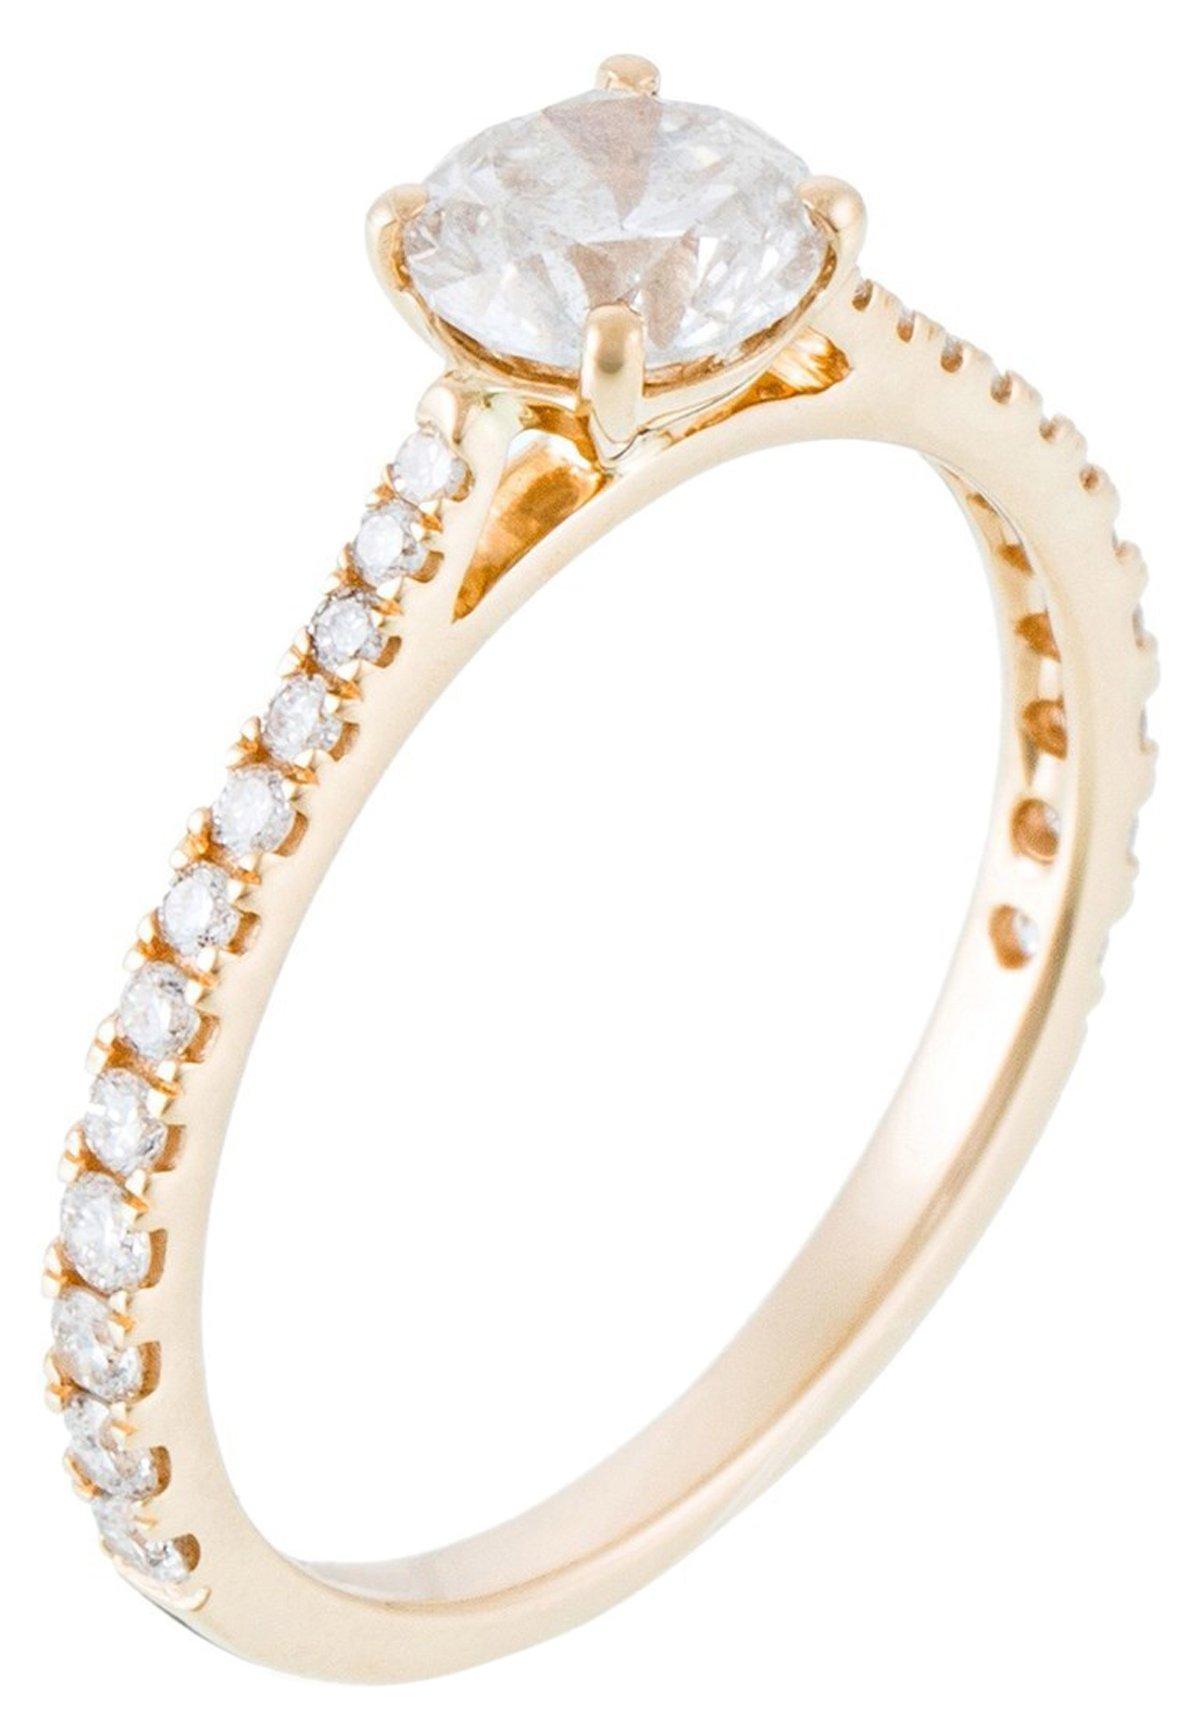 Mujer 18K YELLOW GOLD RING  CERTIFIED 25 DIAMONDS HSI AND 24 DIAMONDS 0.30 CT - Anillo